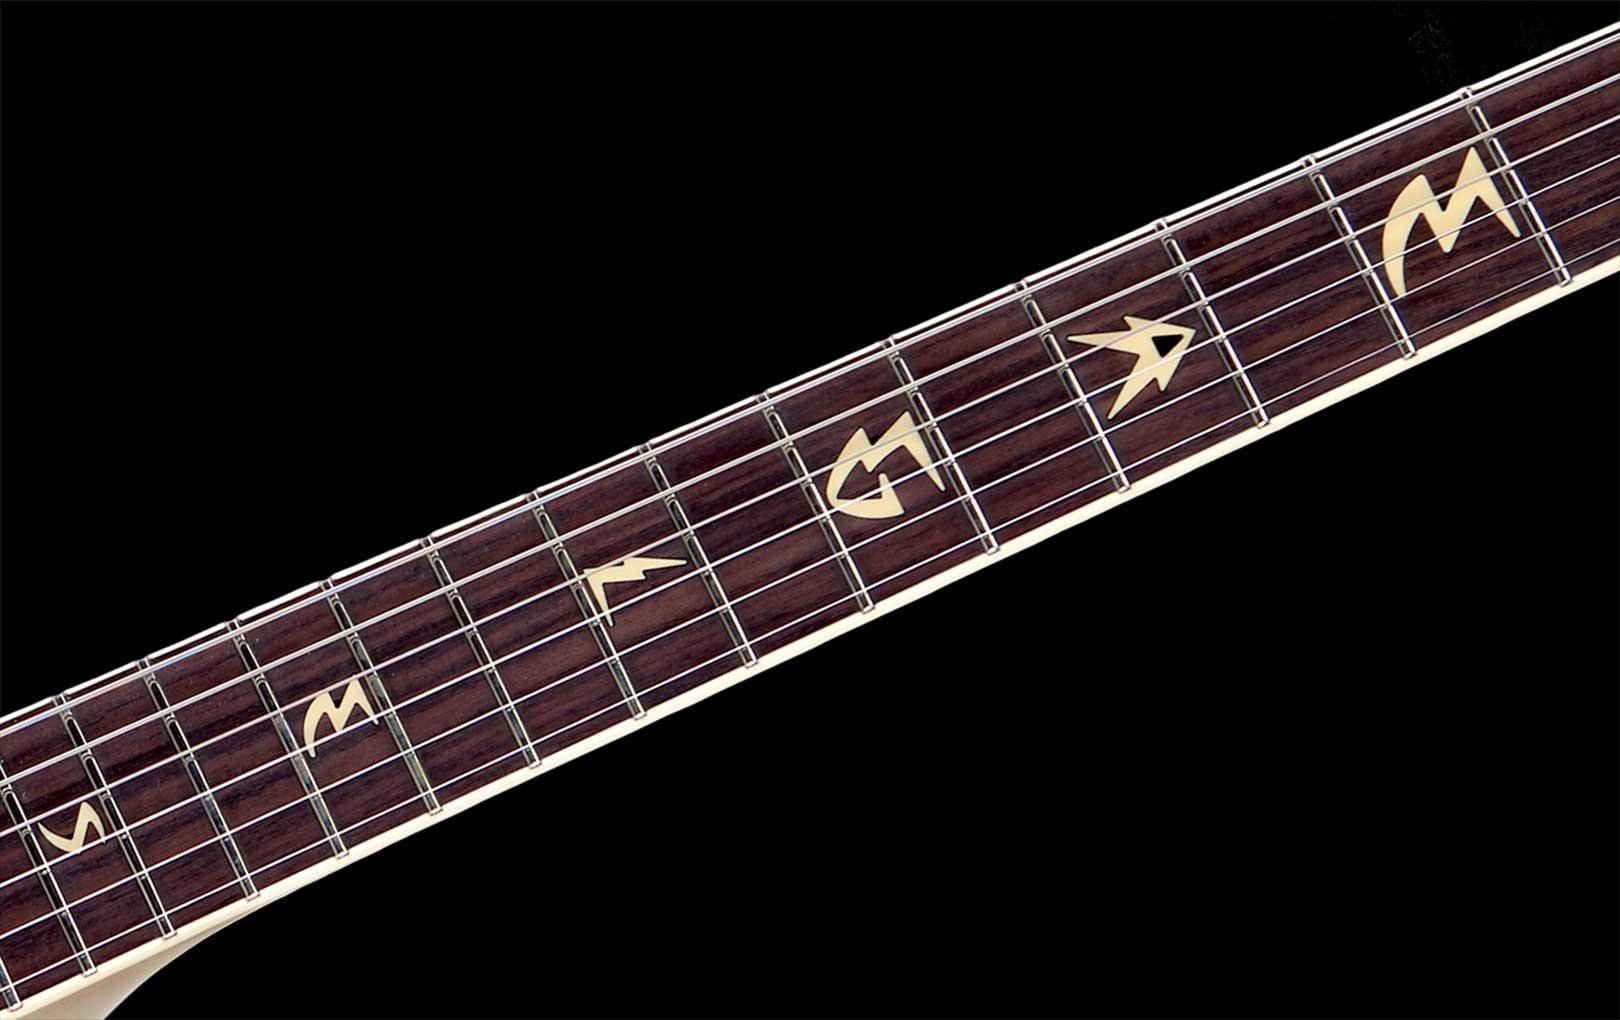 Гриф гитары для группы The Eagles